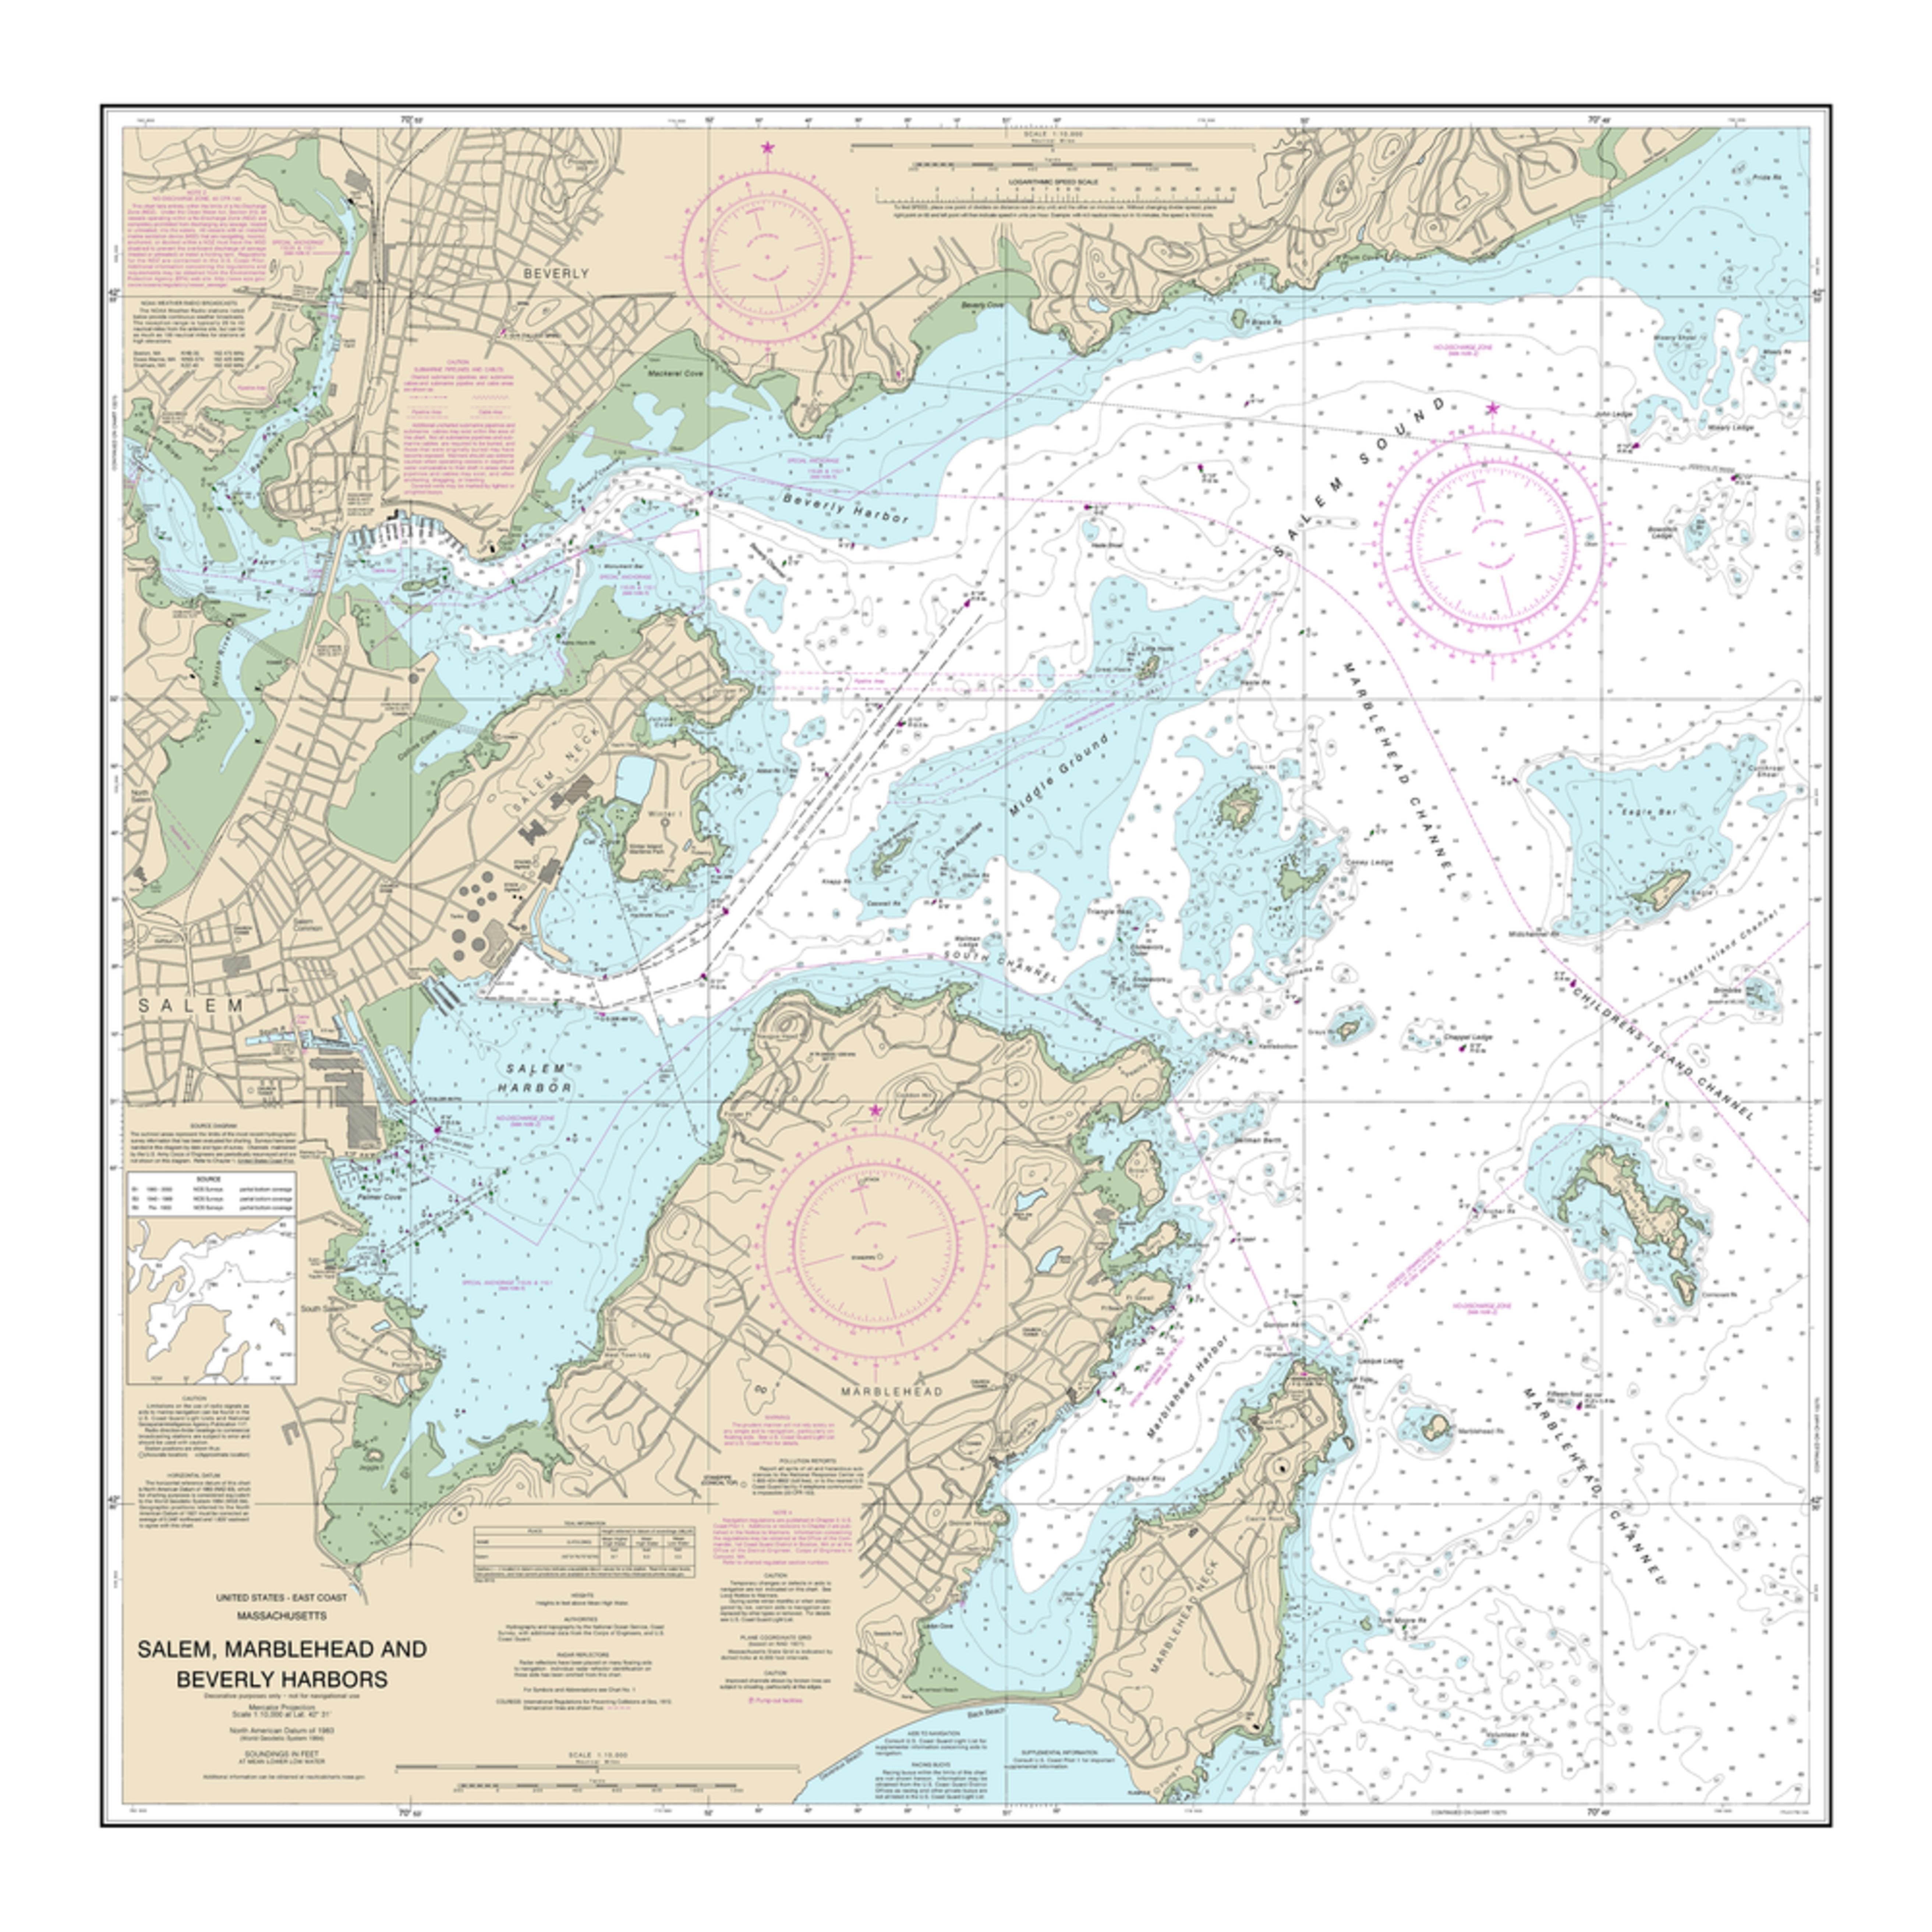 Nauticalmap 13276 salem marblehead beverly harbors xgmbet